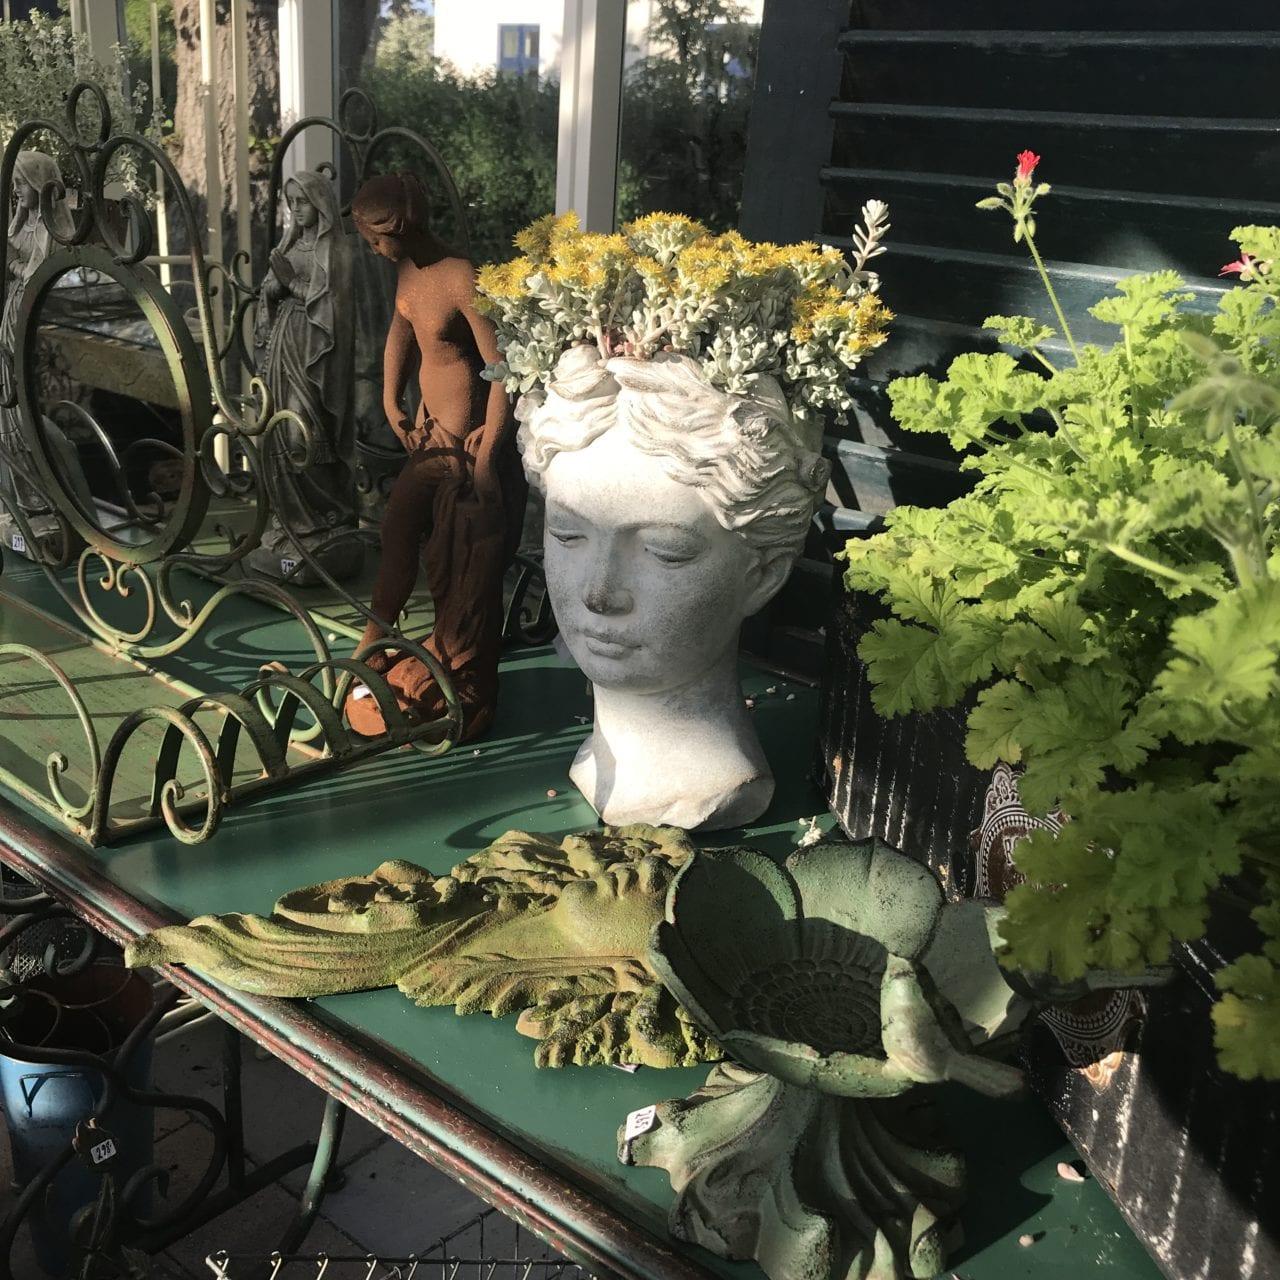 Jansro home & garden